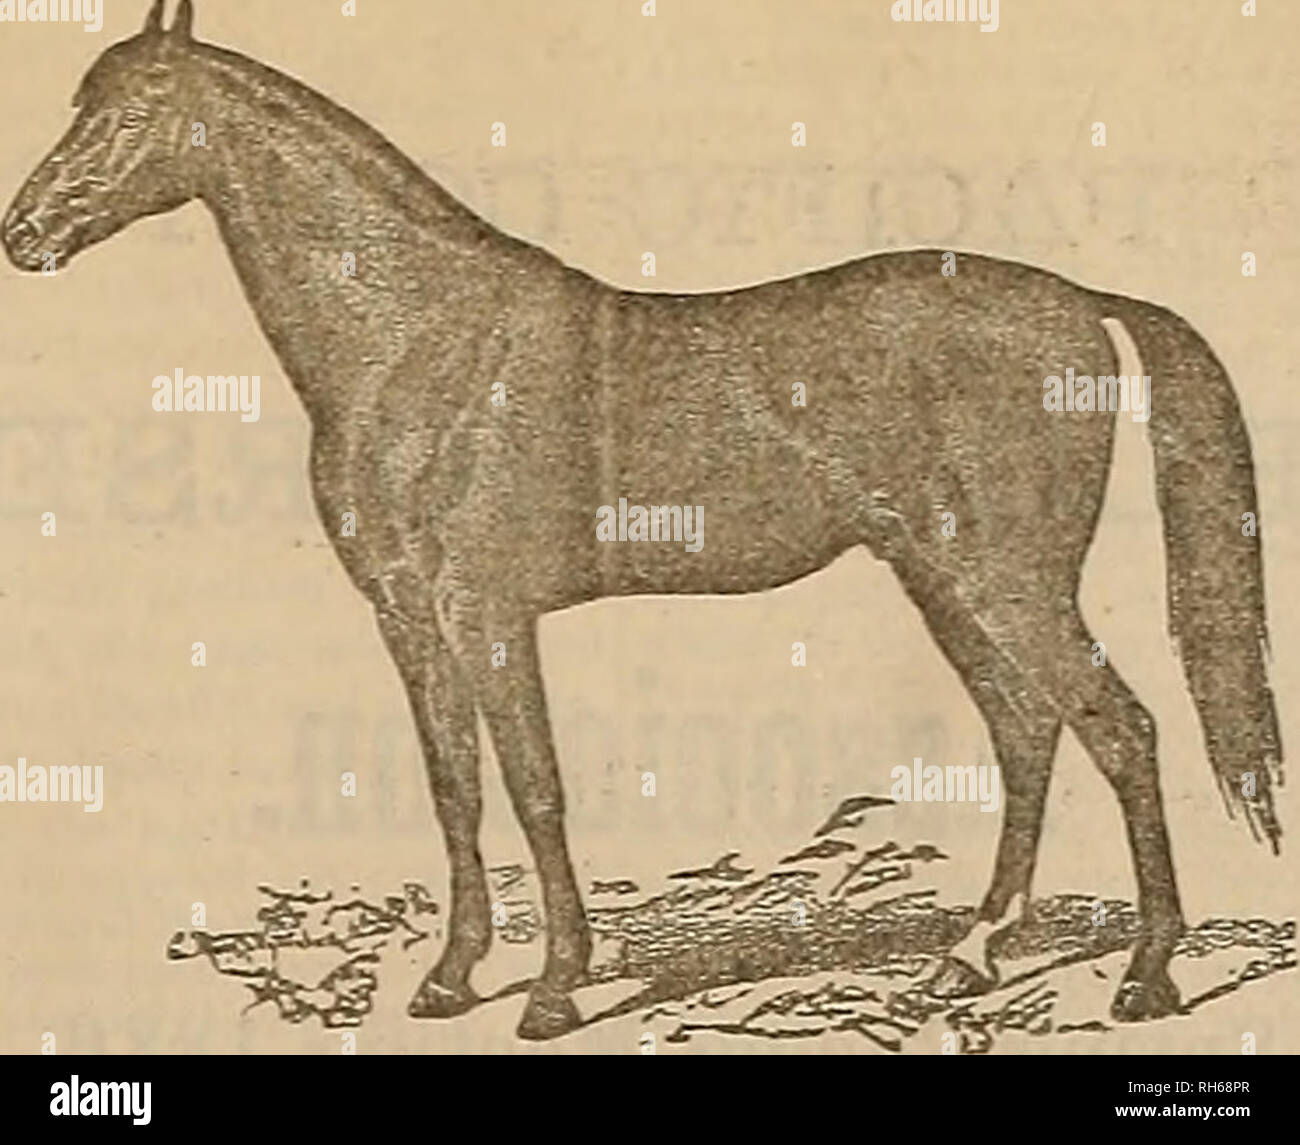 1 guy 1 horse